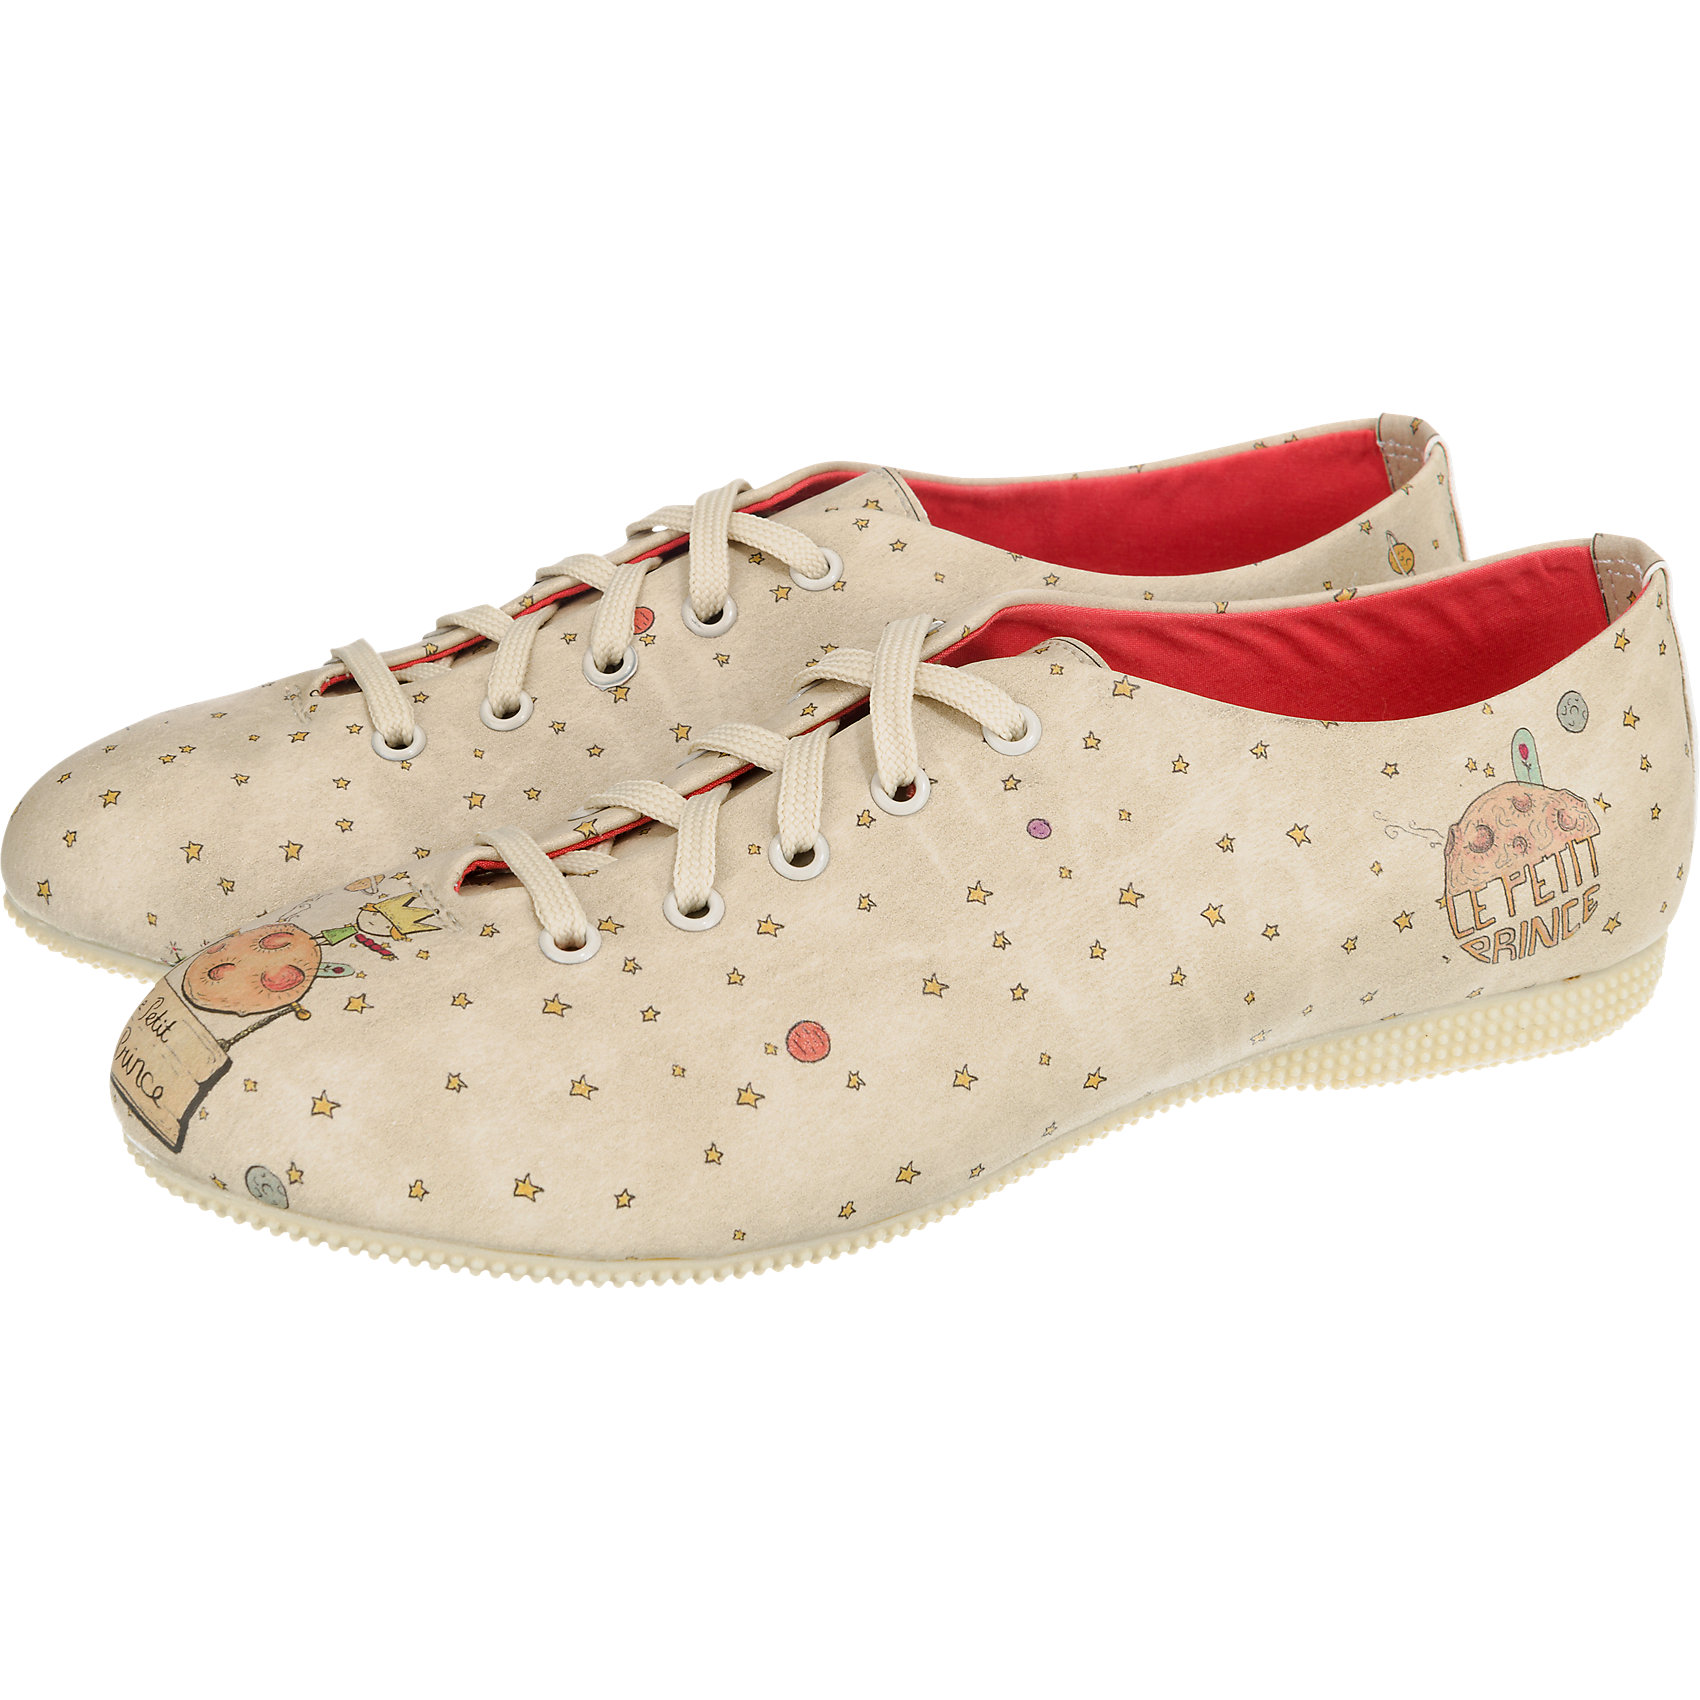 Details zu Neu Dogo Shoes Le Petit Prince Halbschuhe 5775280 für Damen mehrfarbig